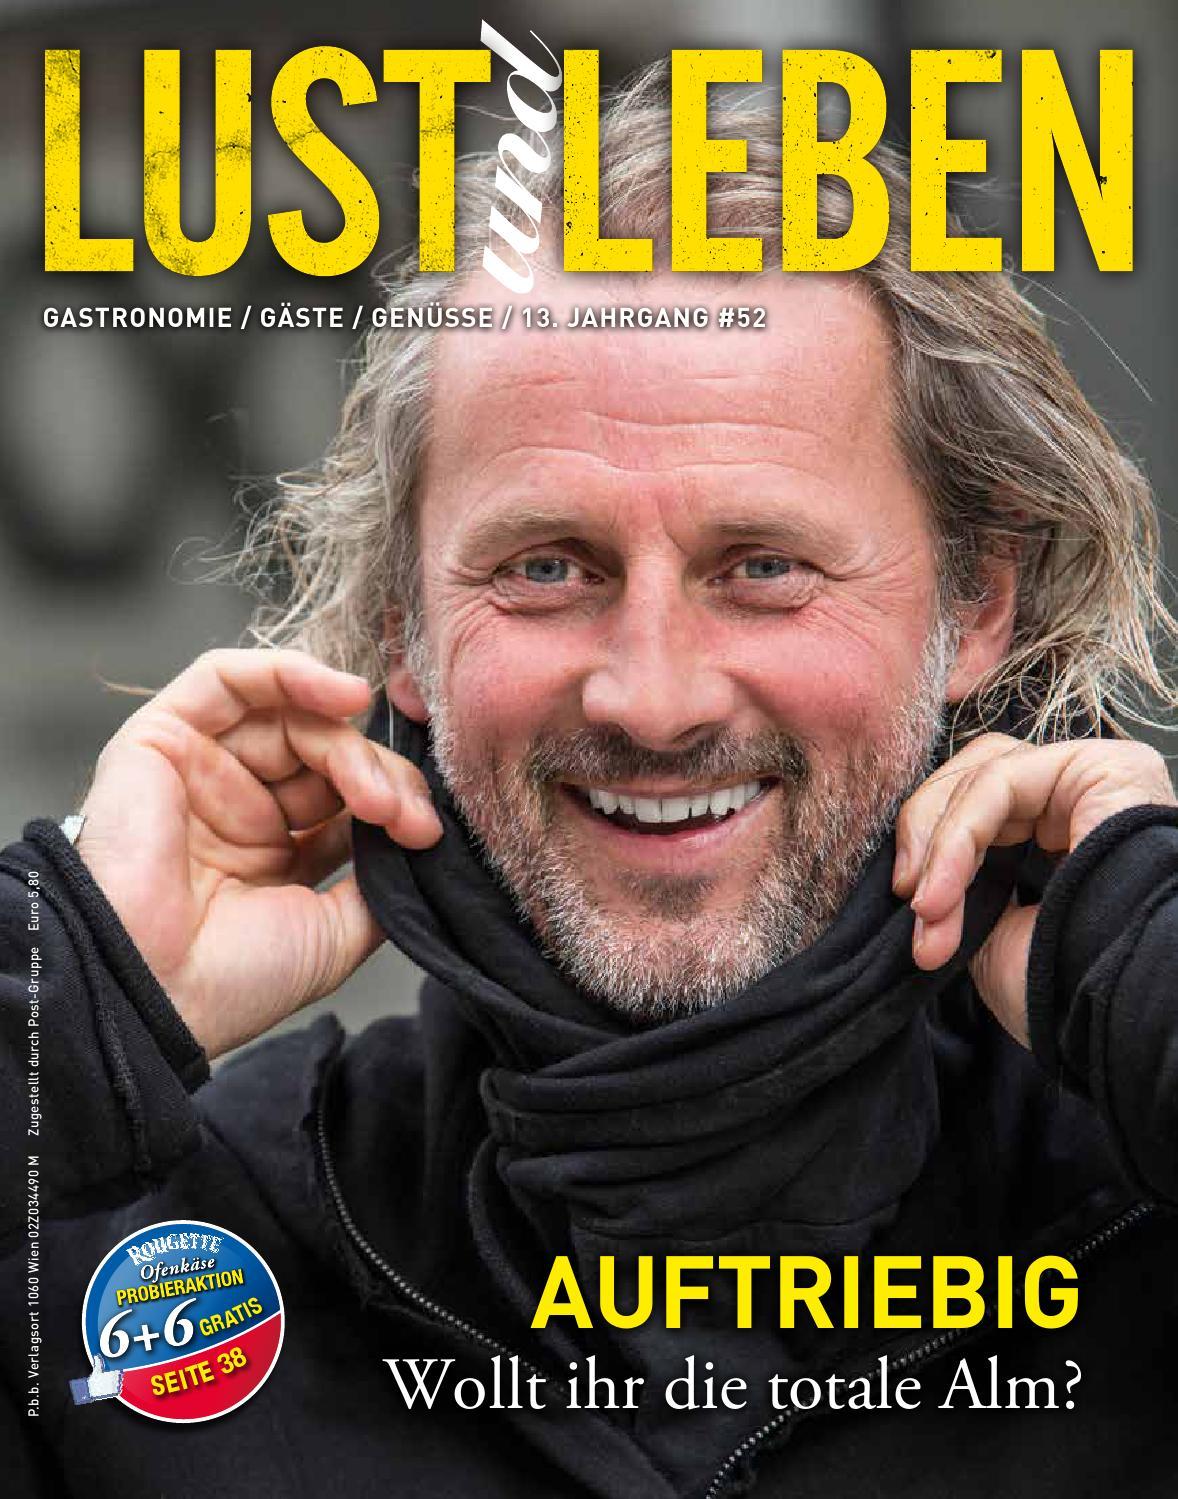 Lust&leben GAST Ausgabe 5 2014 by PEPAMEDIA - issuu